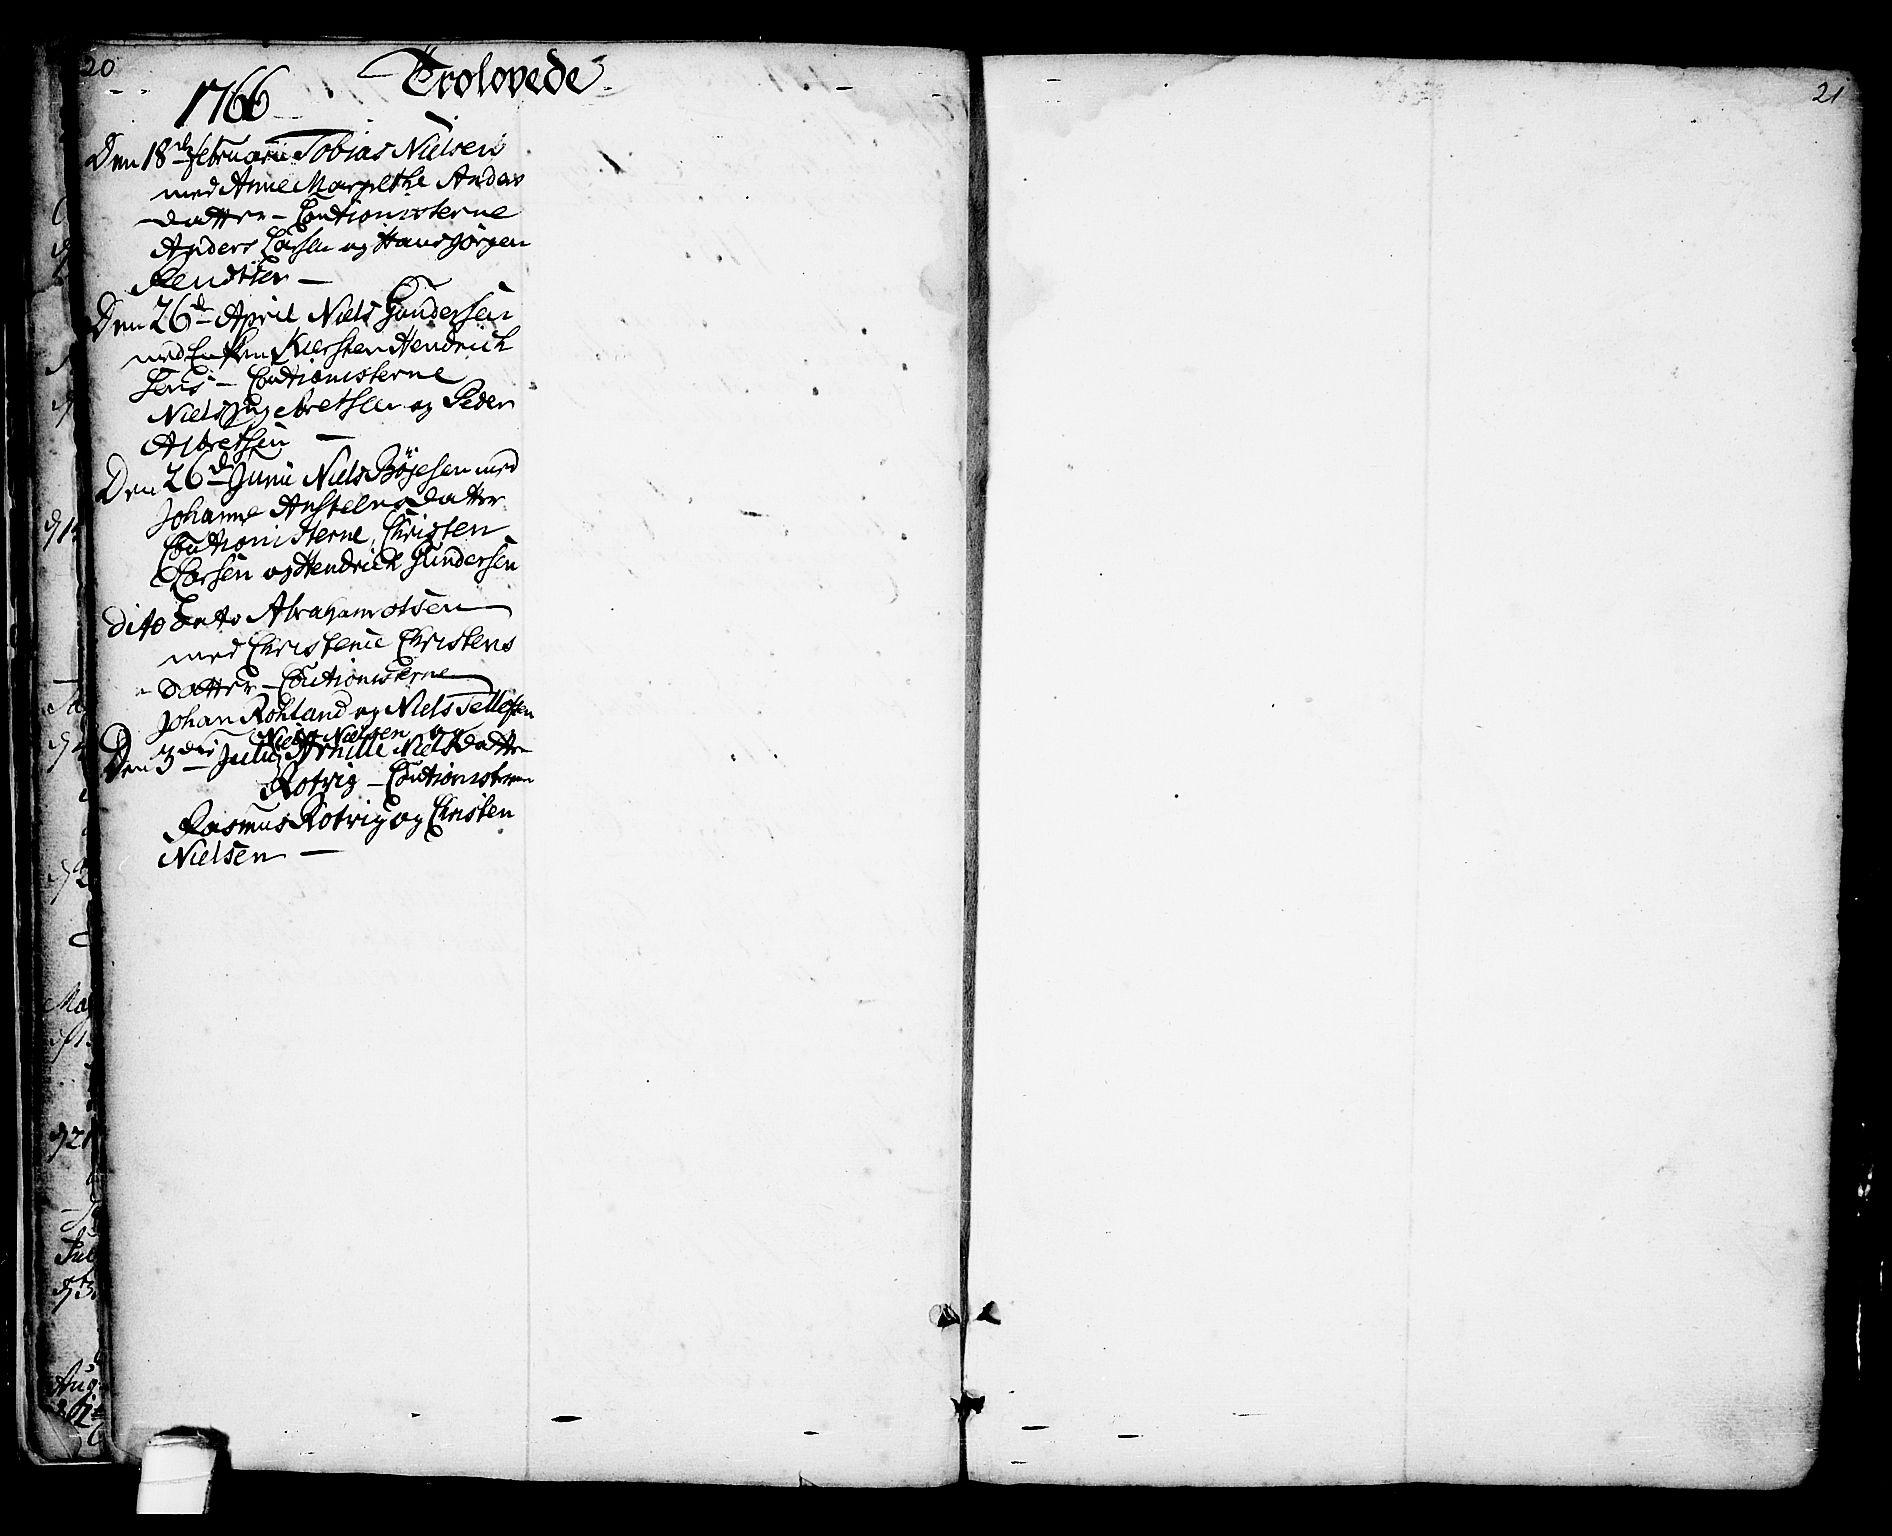 SAKO, Kragerø kirkebøker, F/Fa/L0001: Ministerialbok nr. 1, 1702-1766, s. 20-21